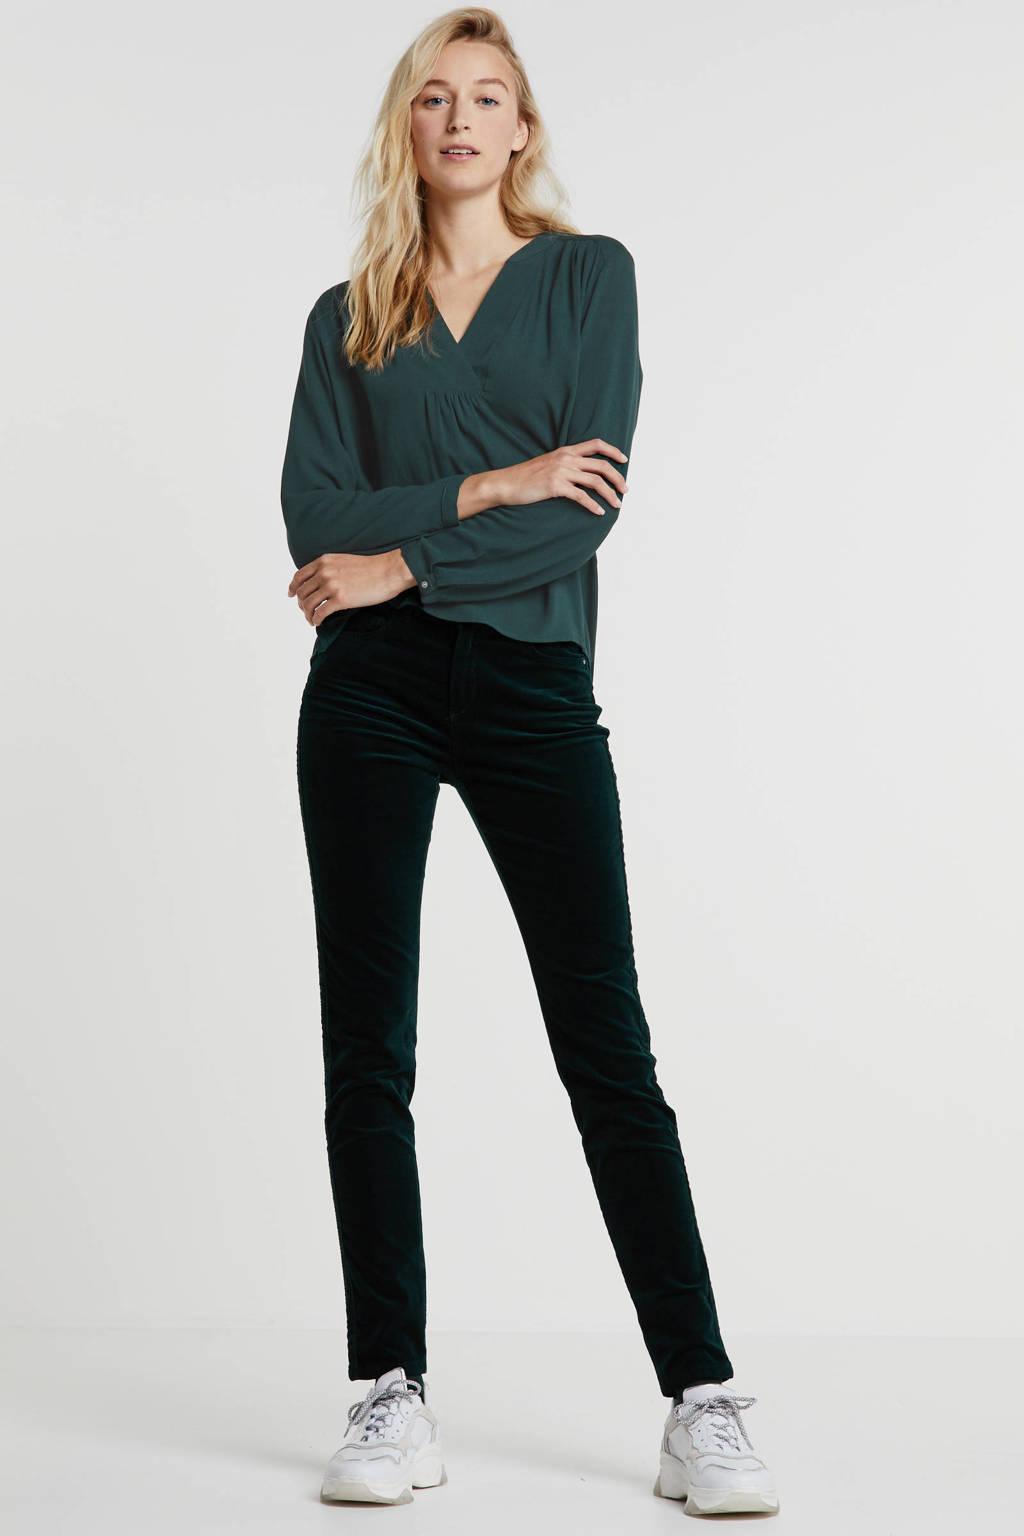 ESPRIT Women Casual corduroy slim fit broek groen, Groen